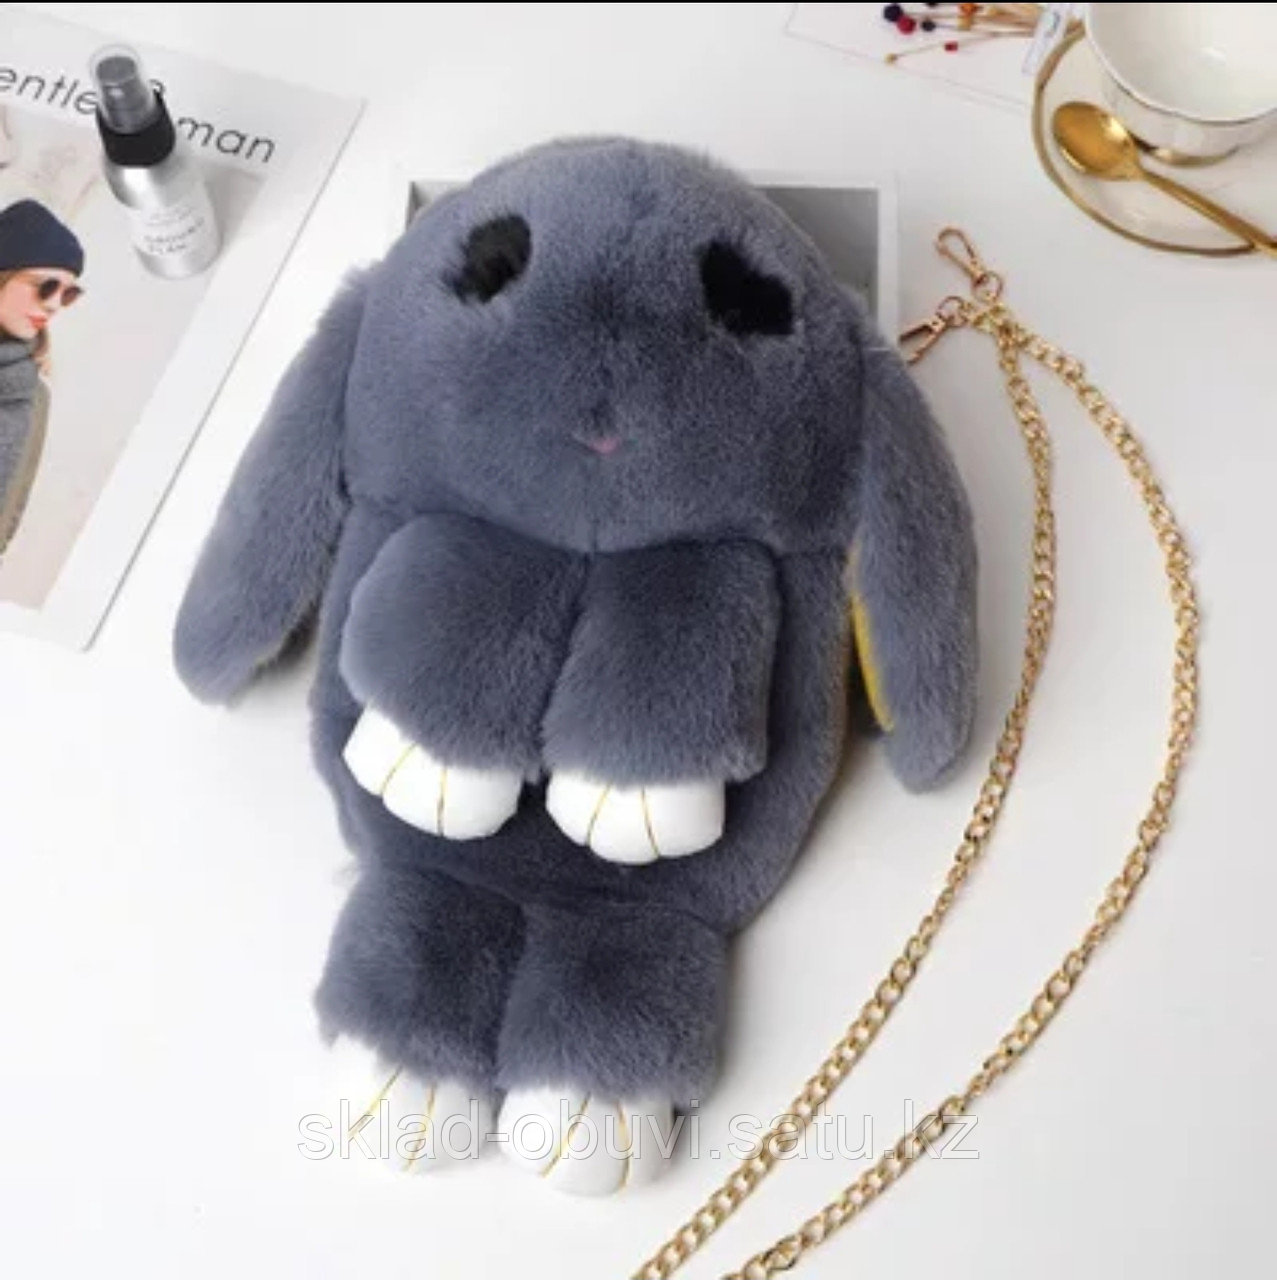 Кролик рюкзак - фото 3